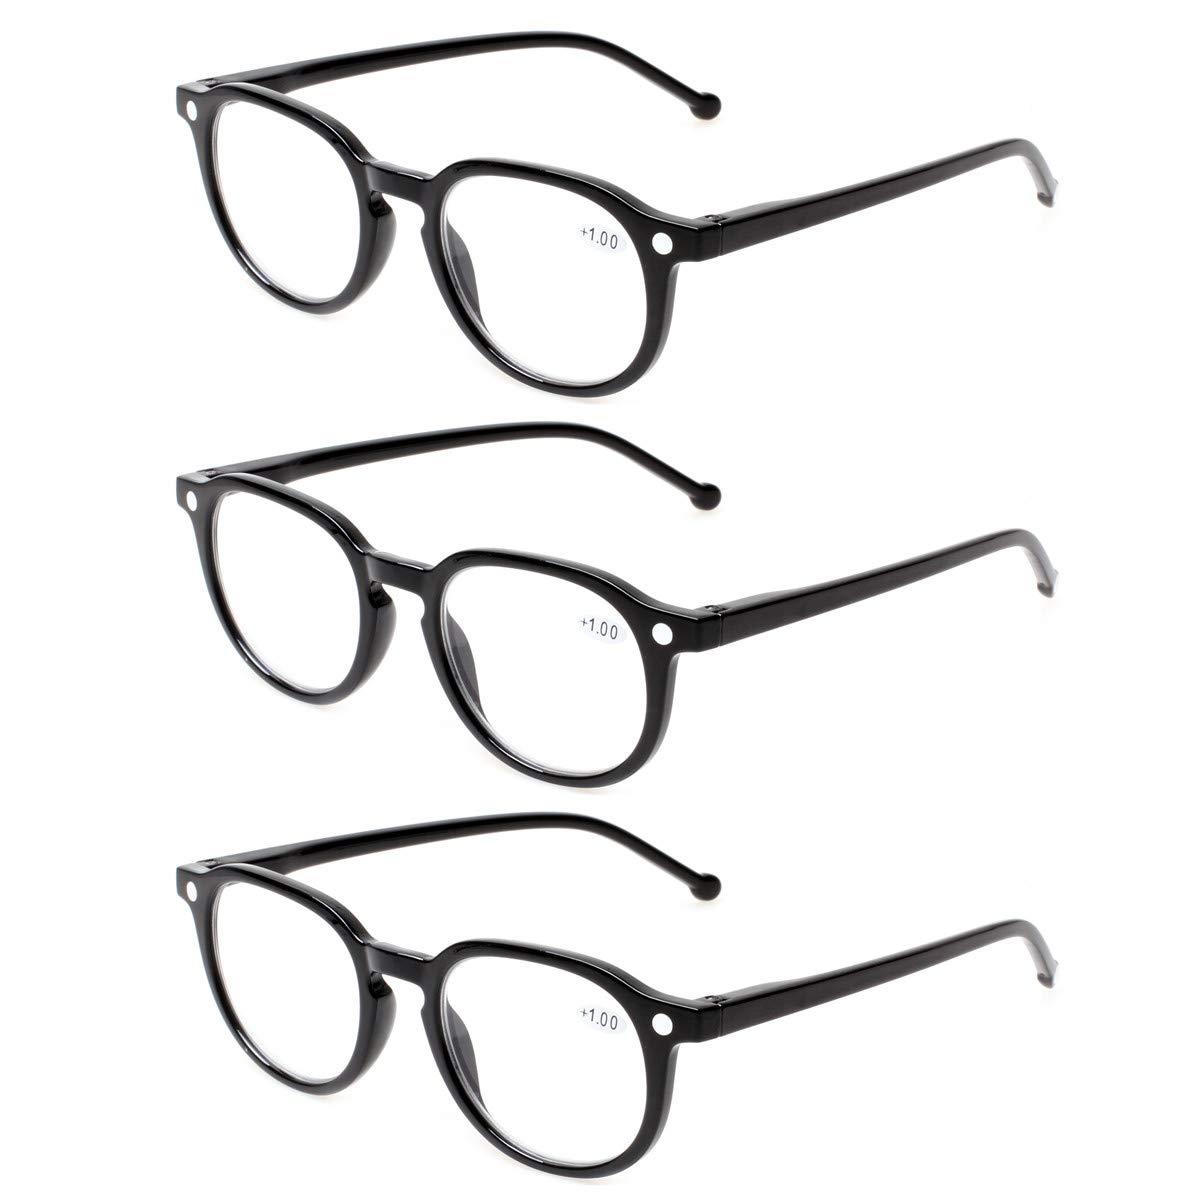 Amazon.com: 3 pares de gafas de lectura, retro, redondas ...